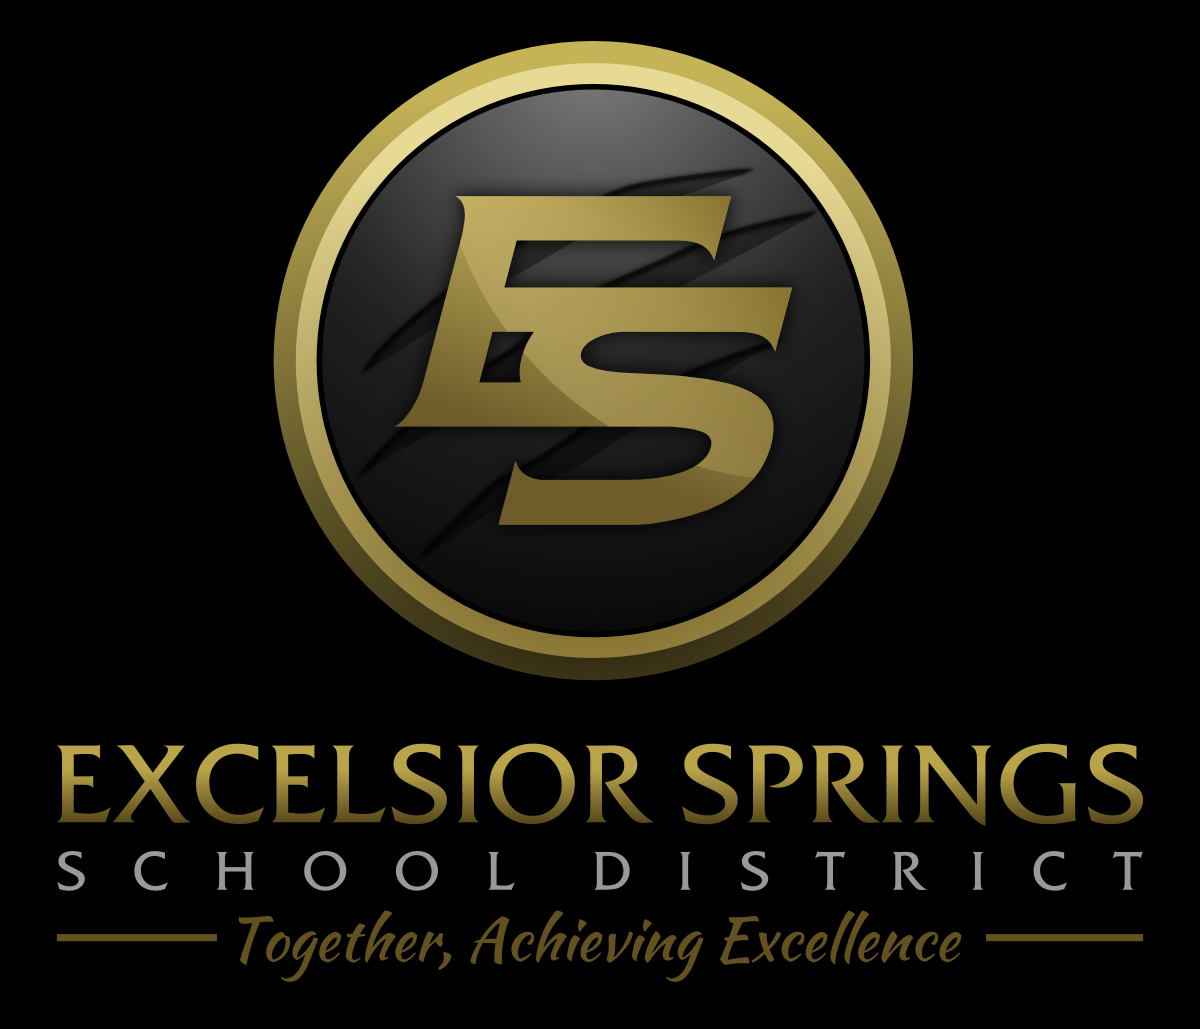 exc spr school